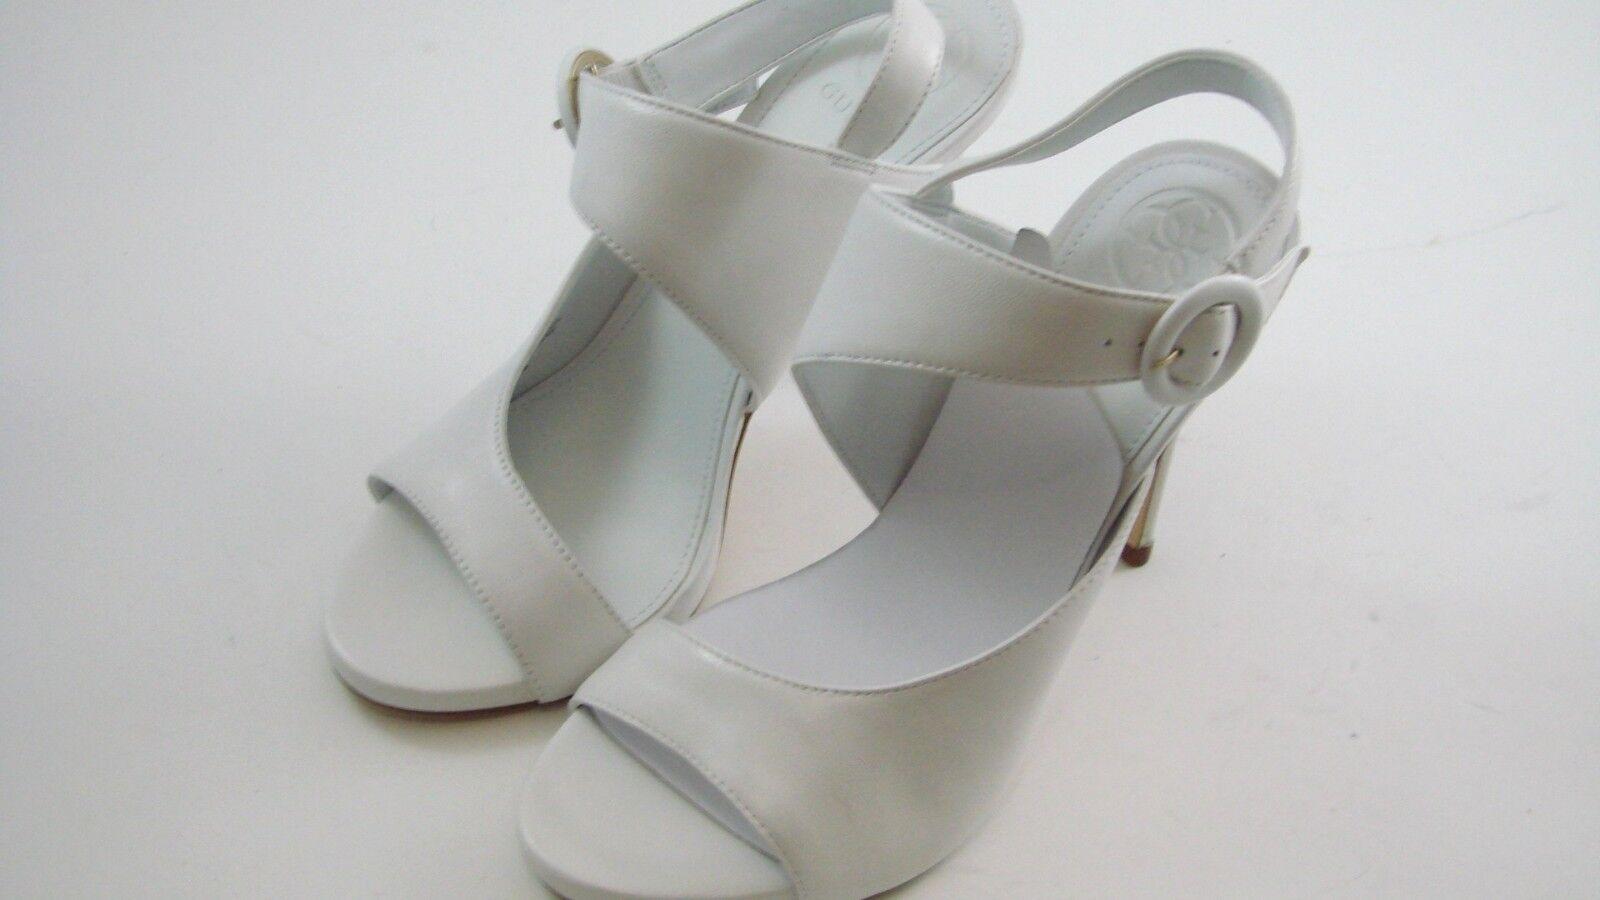 GUESS White Women's Tyson Shoes Tyson Women's Asymmetrical Sandals  Size 7.5 M hat28-519 $99 2e4a8d